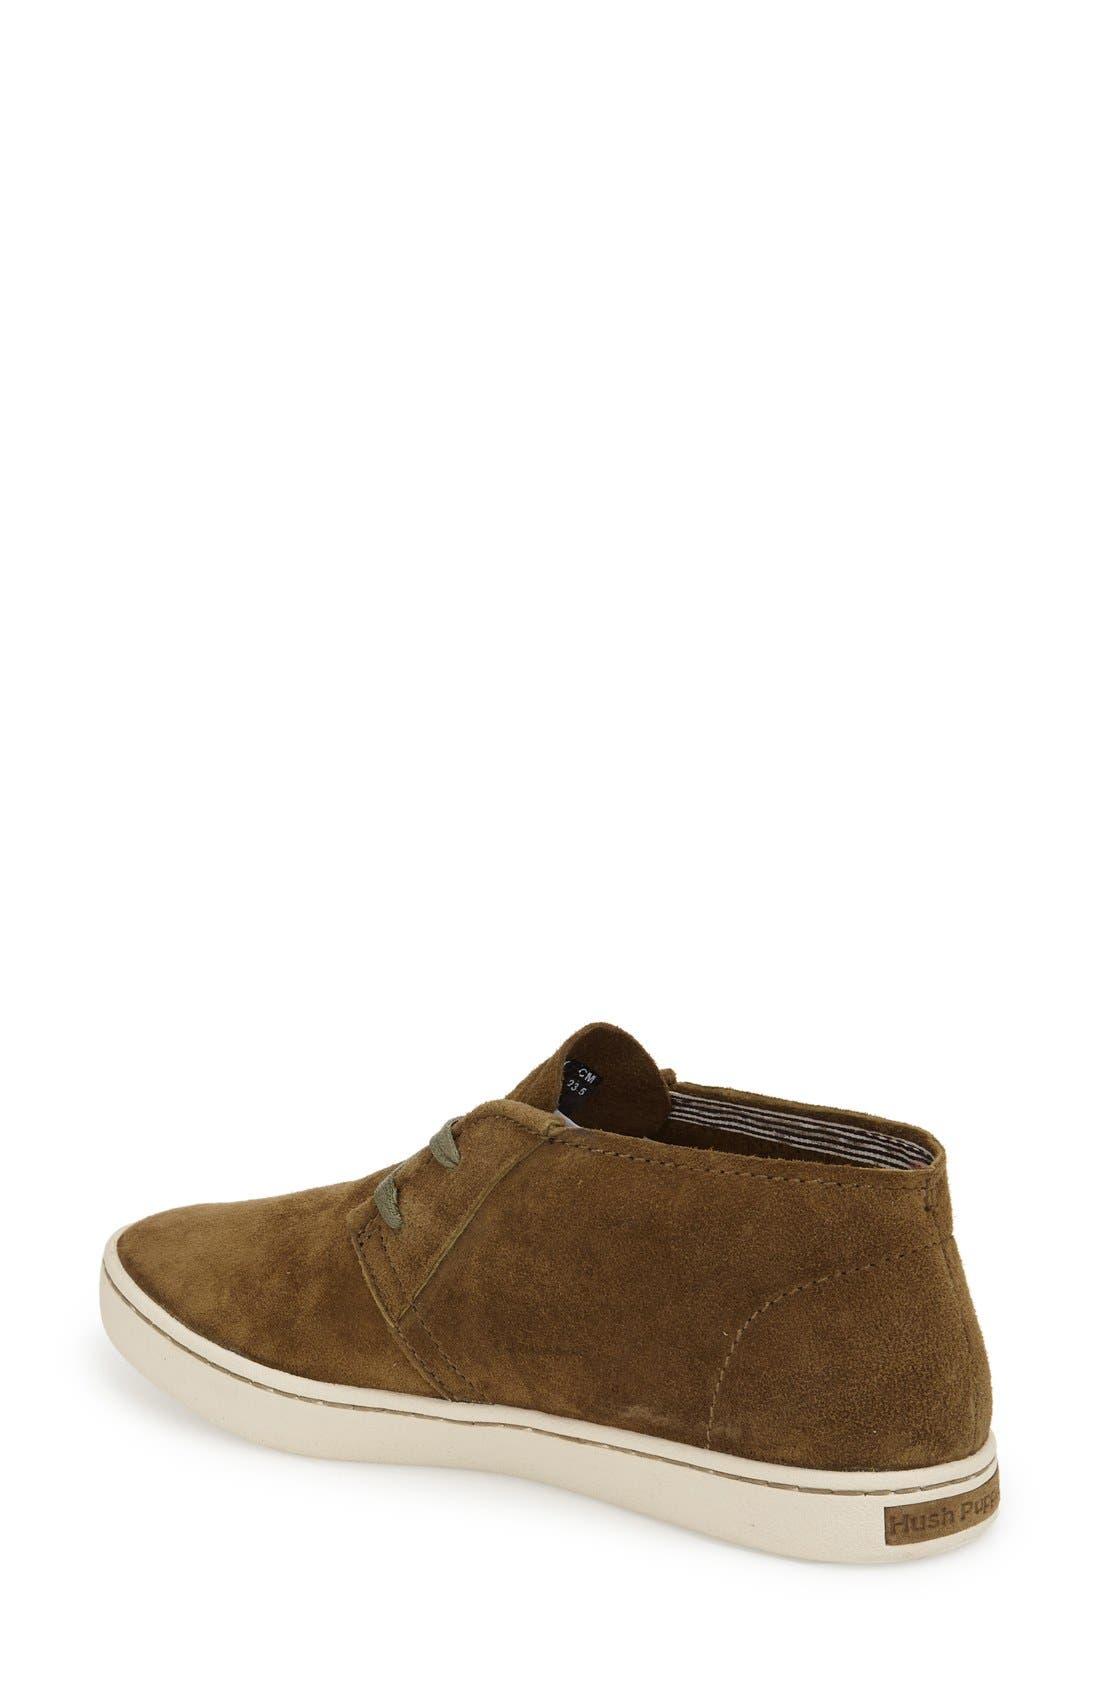 'Cille Gwen' Sneaker,                             Alternate thumbnail 10, color,